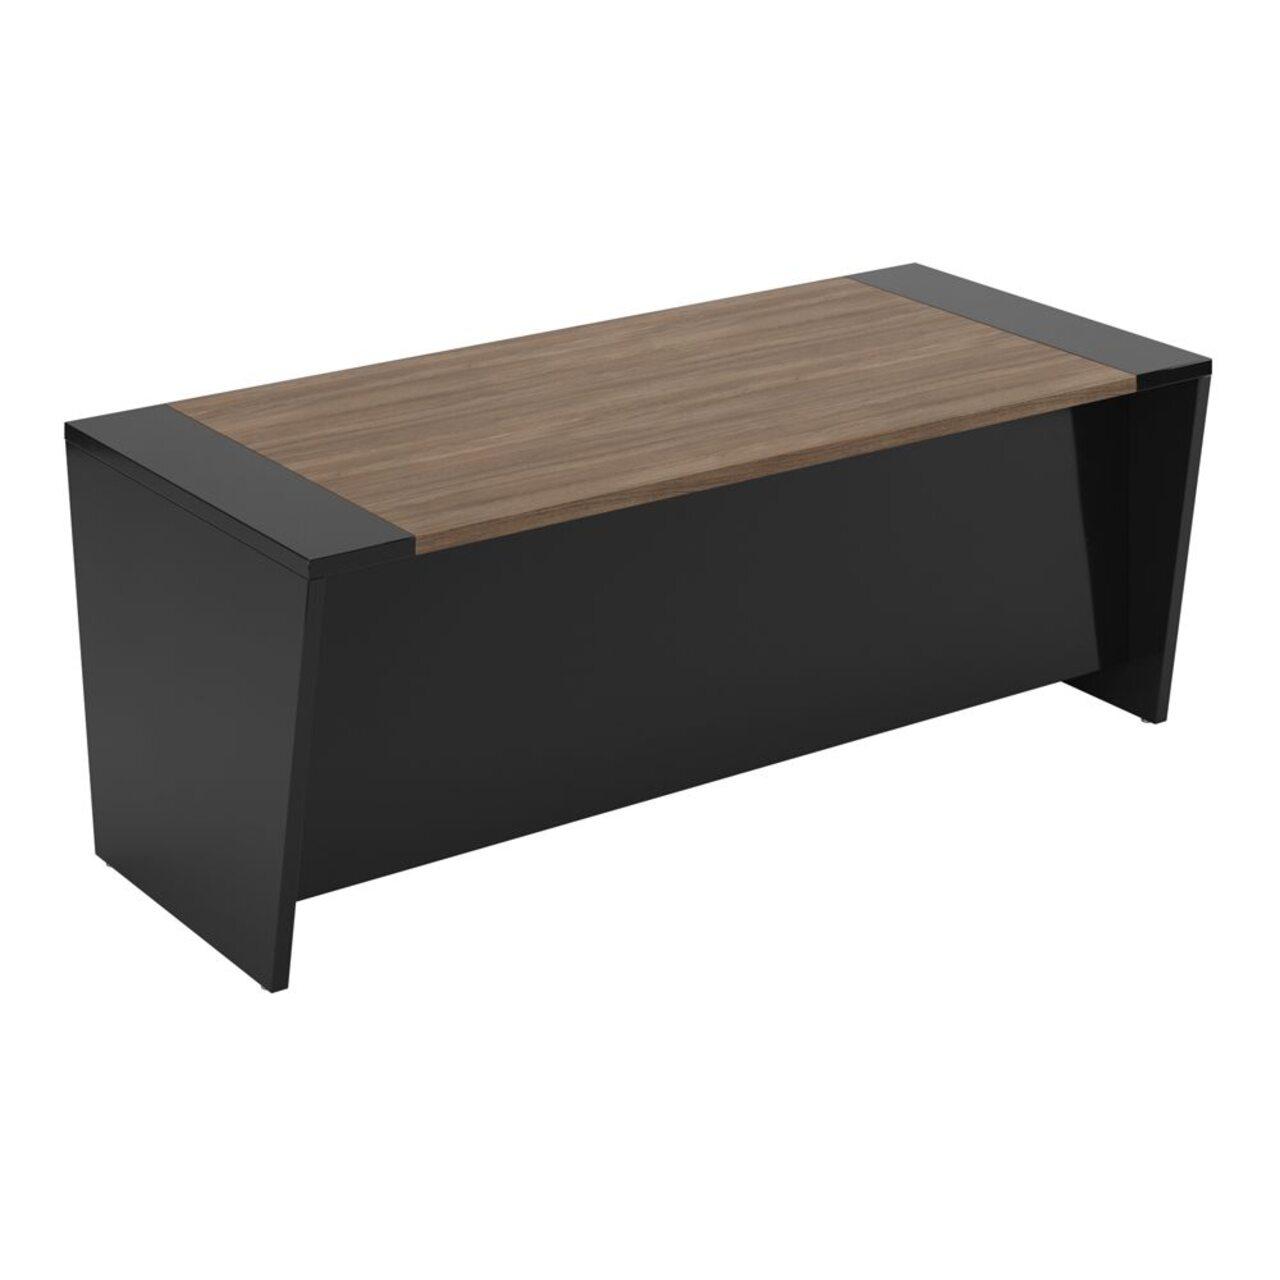 Стол письменный 200 (панель глянец)  ASTI 200x90x75 - фото 3